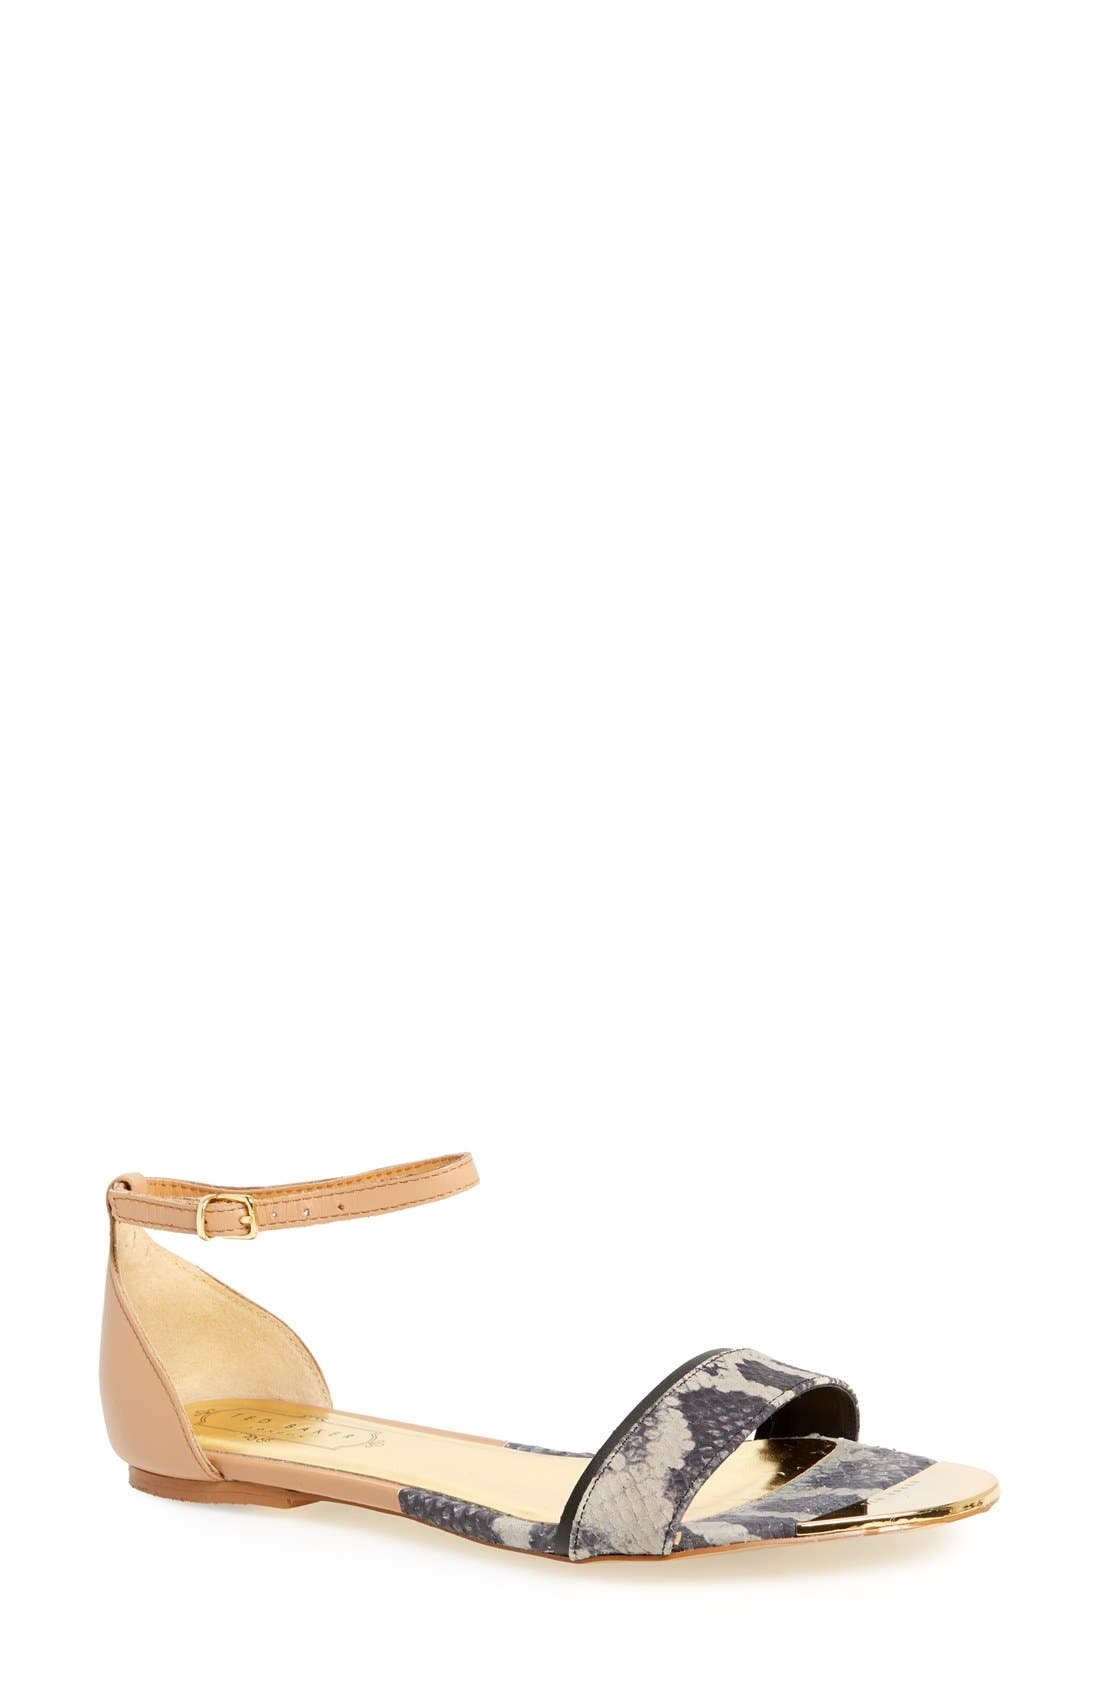 Alternate Image 1 Selected - Ted Baker London 'Nayna' Sandal